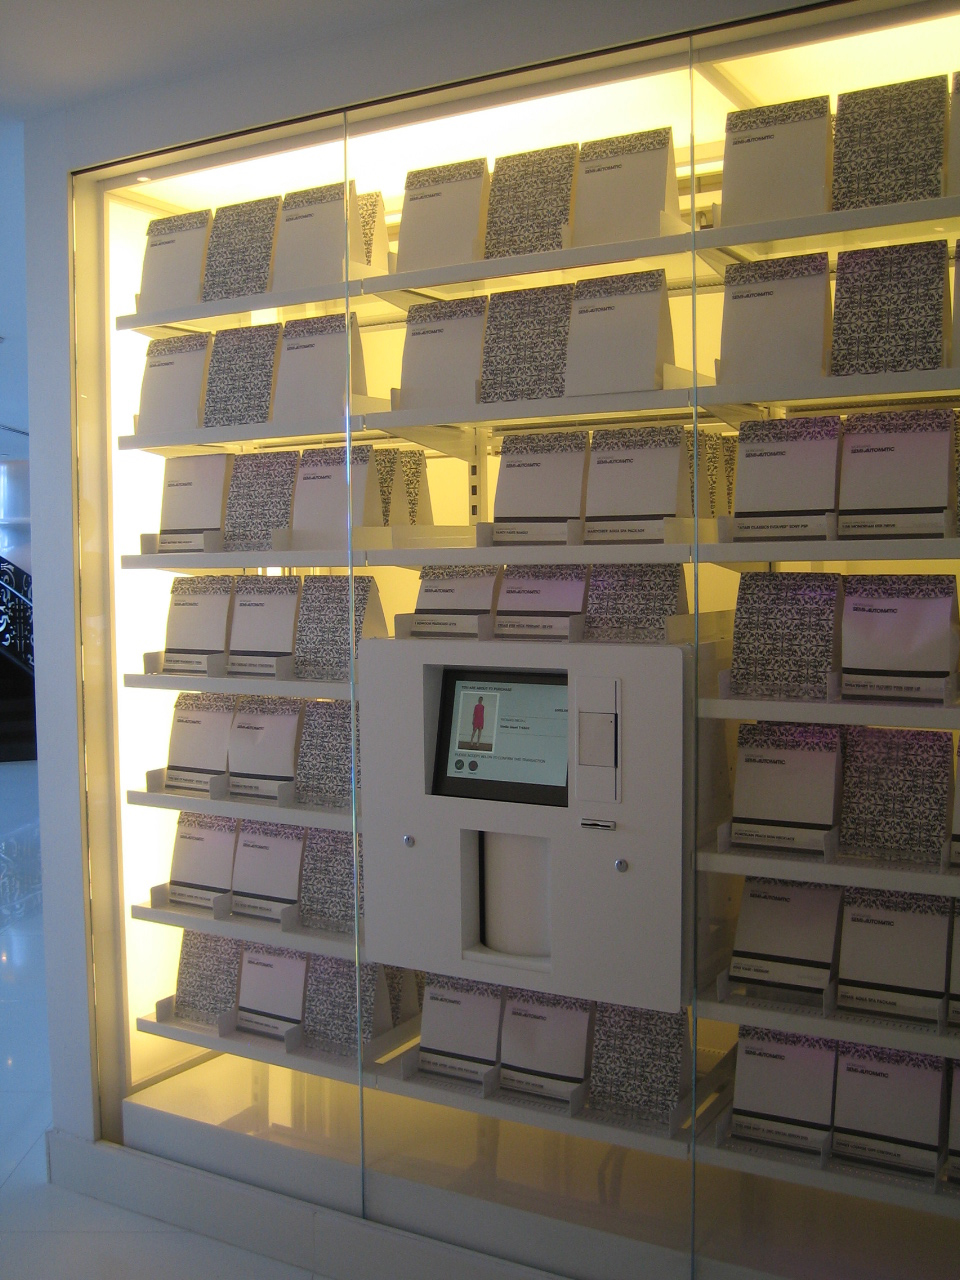 miami vending machine mondrian